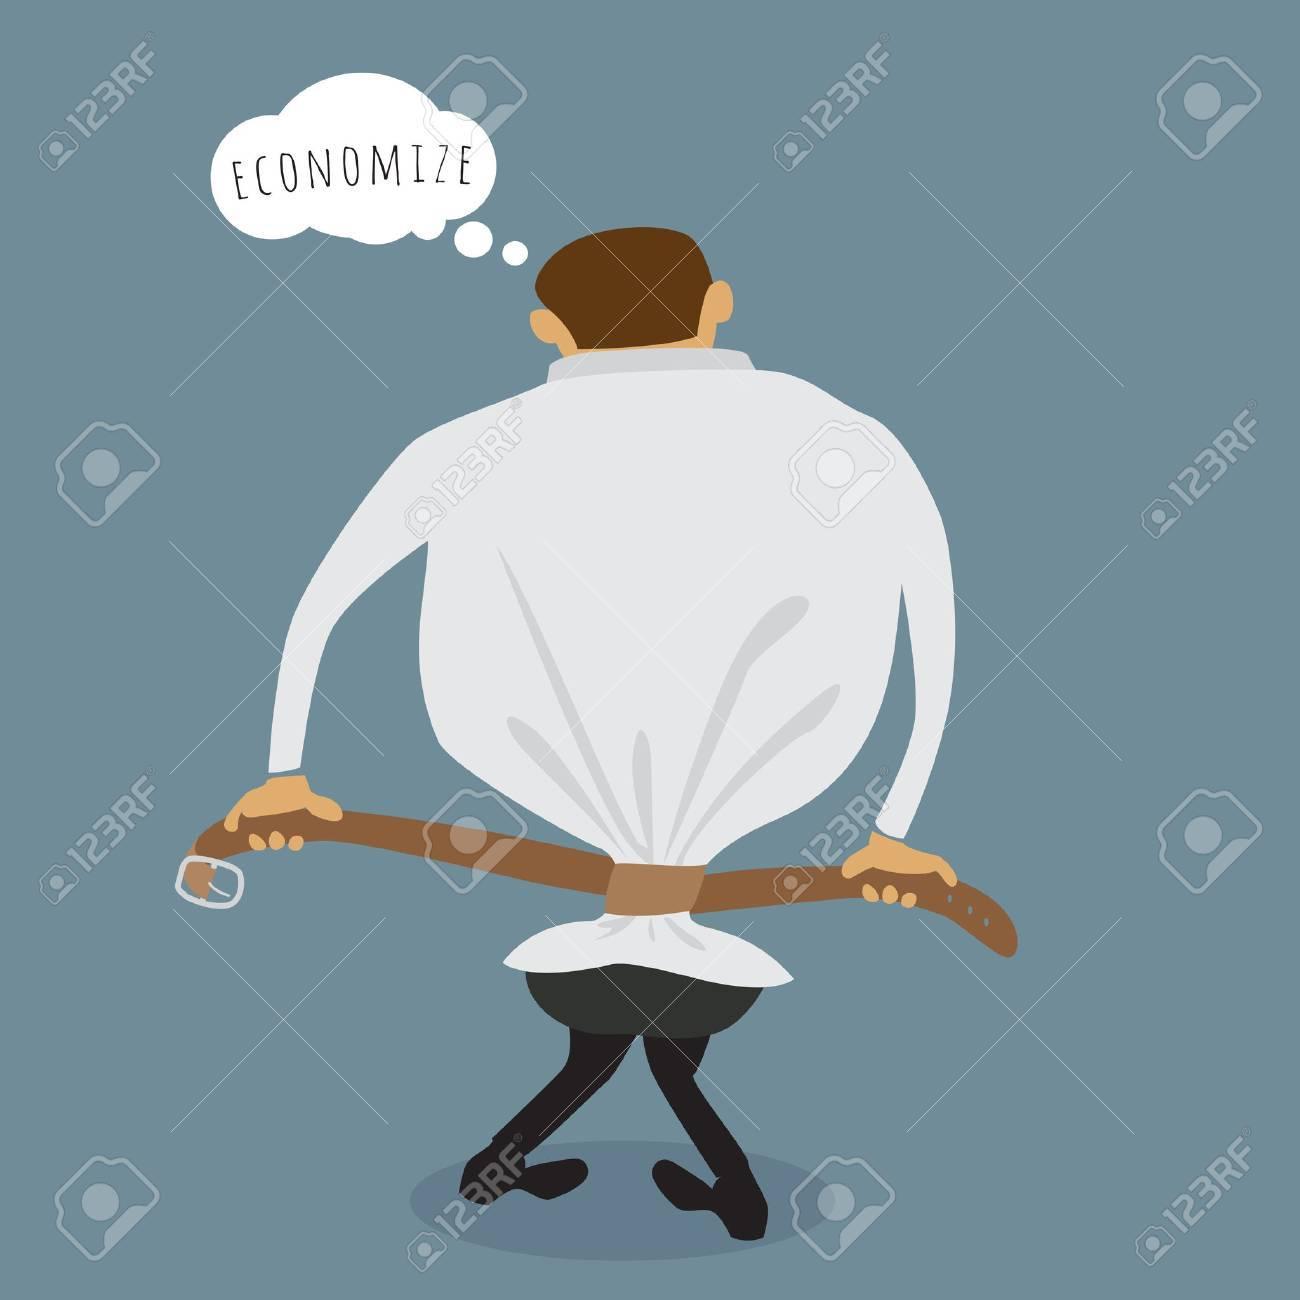 The Man pulls his belt, abstract economize conceptual, illustration vector design Stock Vector - 26375824